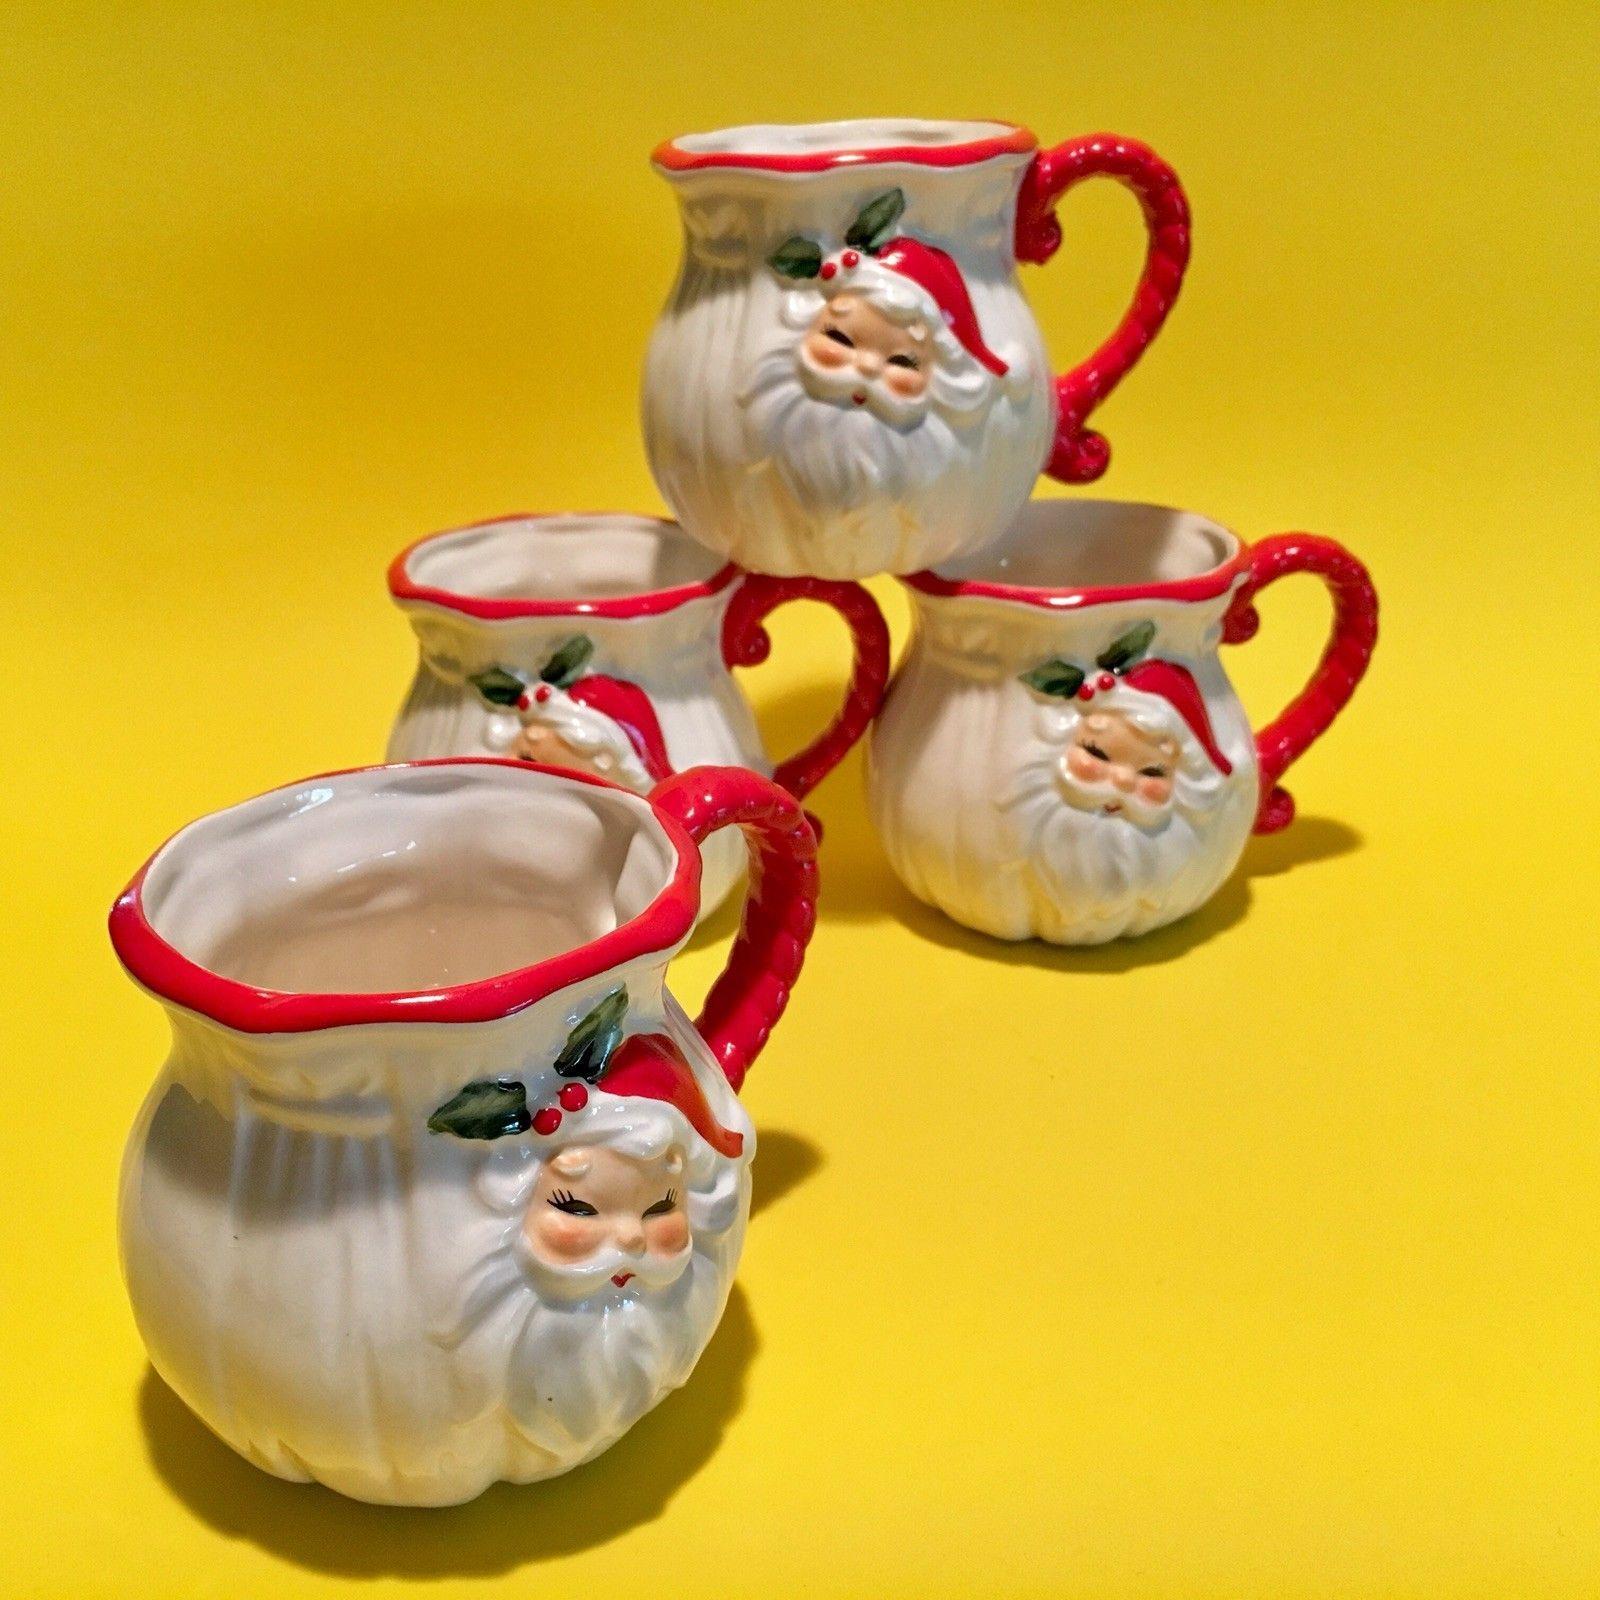 4 Vintage Josef Originals Santa Ceramic Cups Mugs Christmas ...